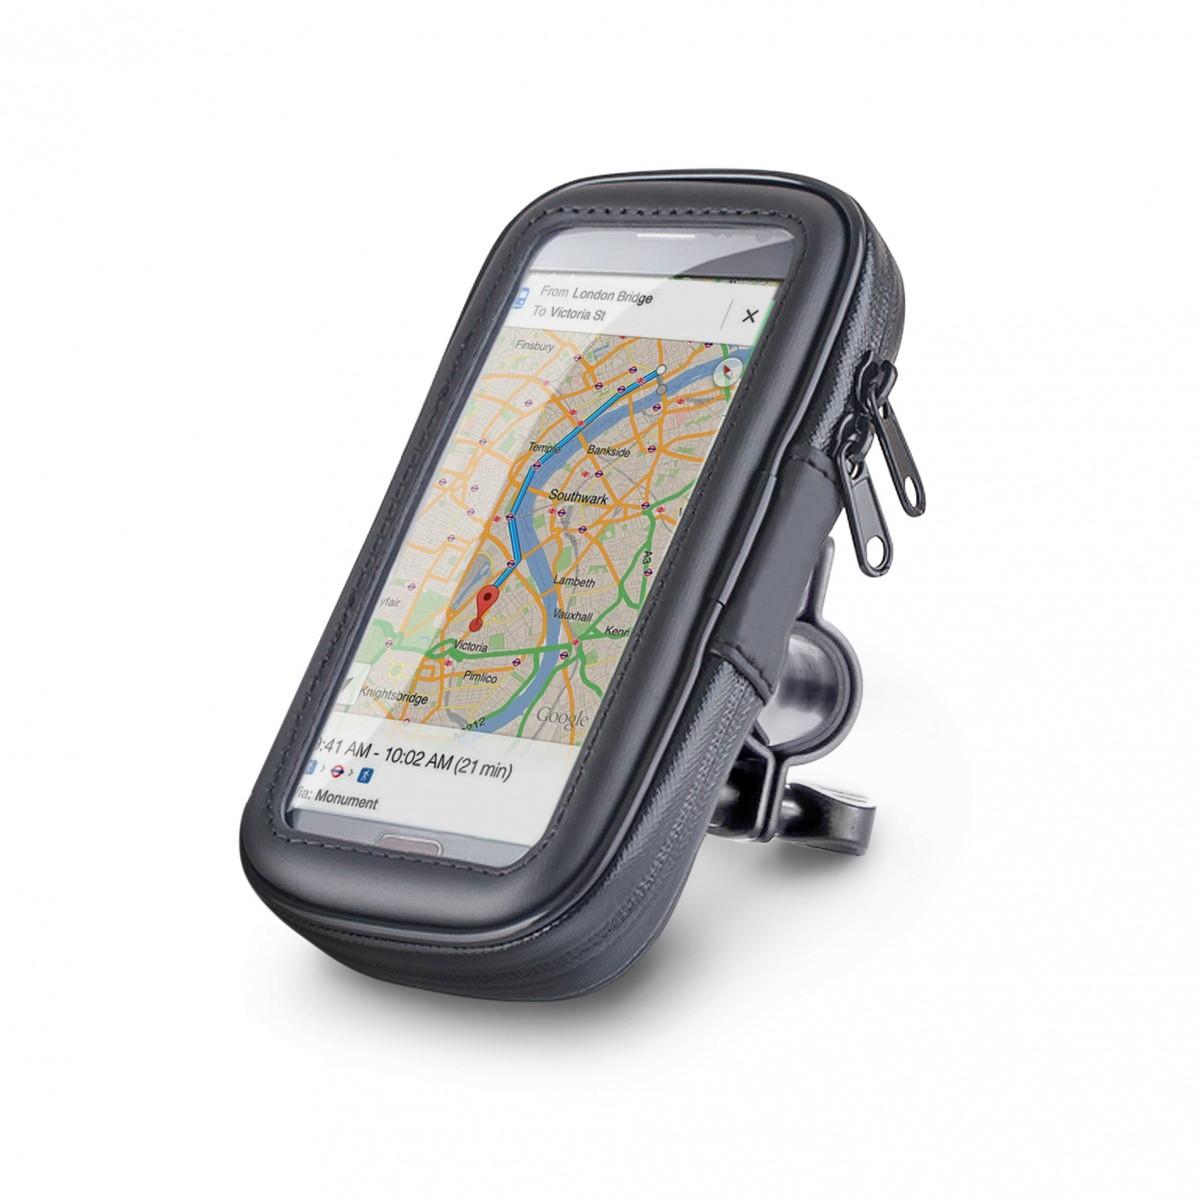 Esperanza EMH116 - bicycle holder To Telephone SAND XL (82x160mm) Mobilo telefonu turētāji